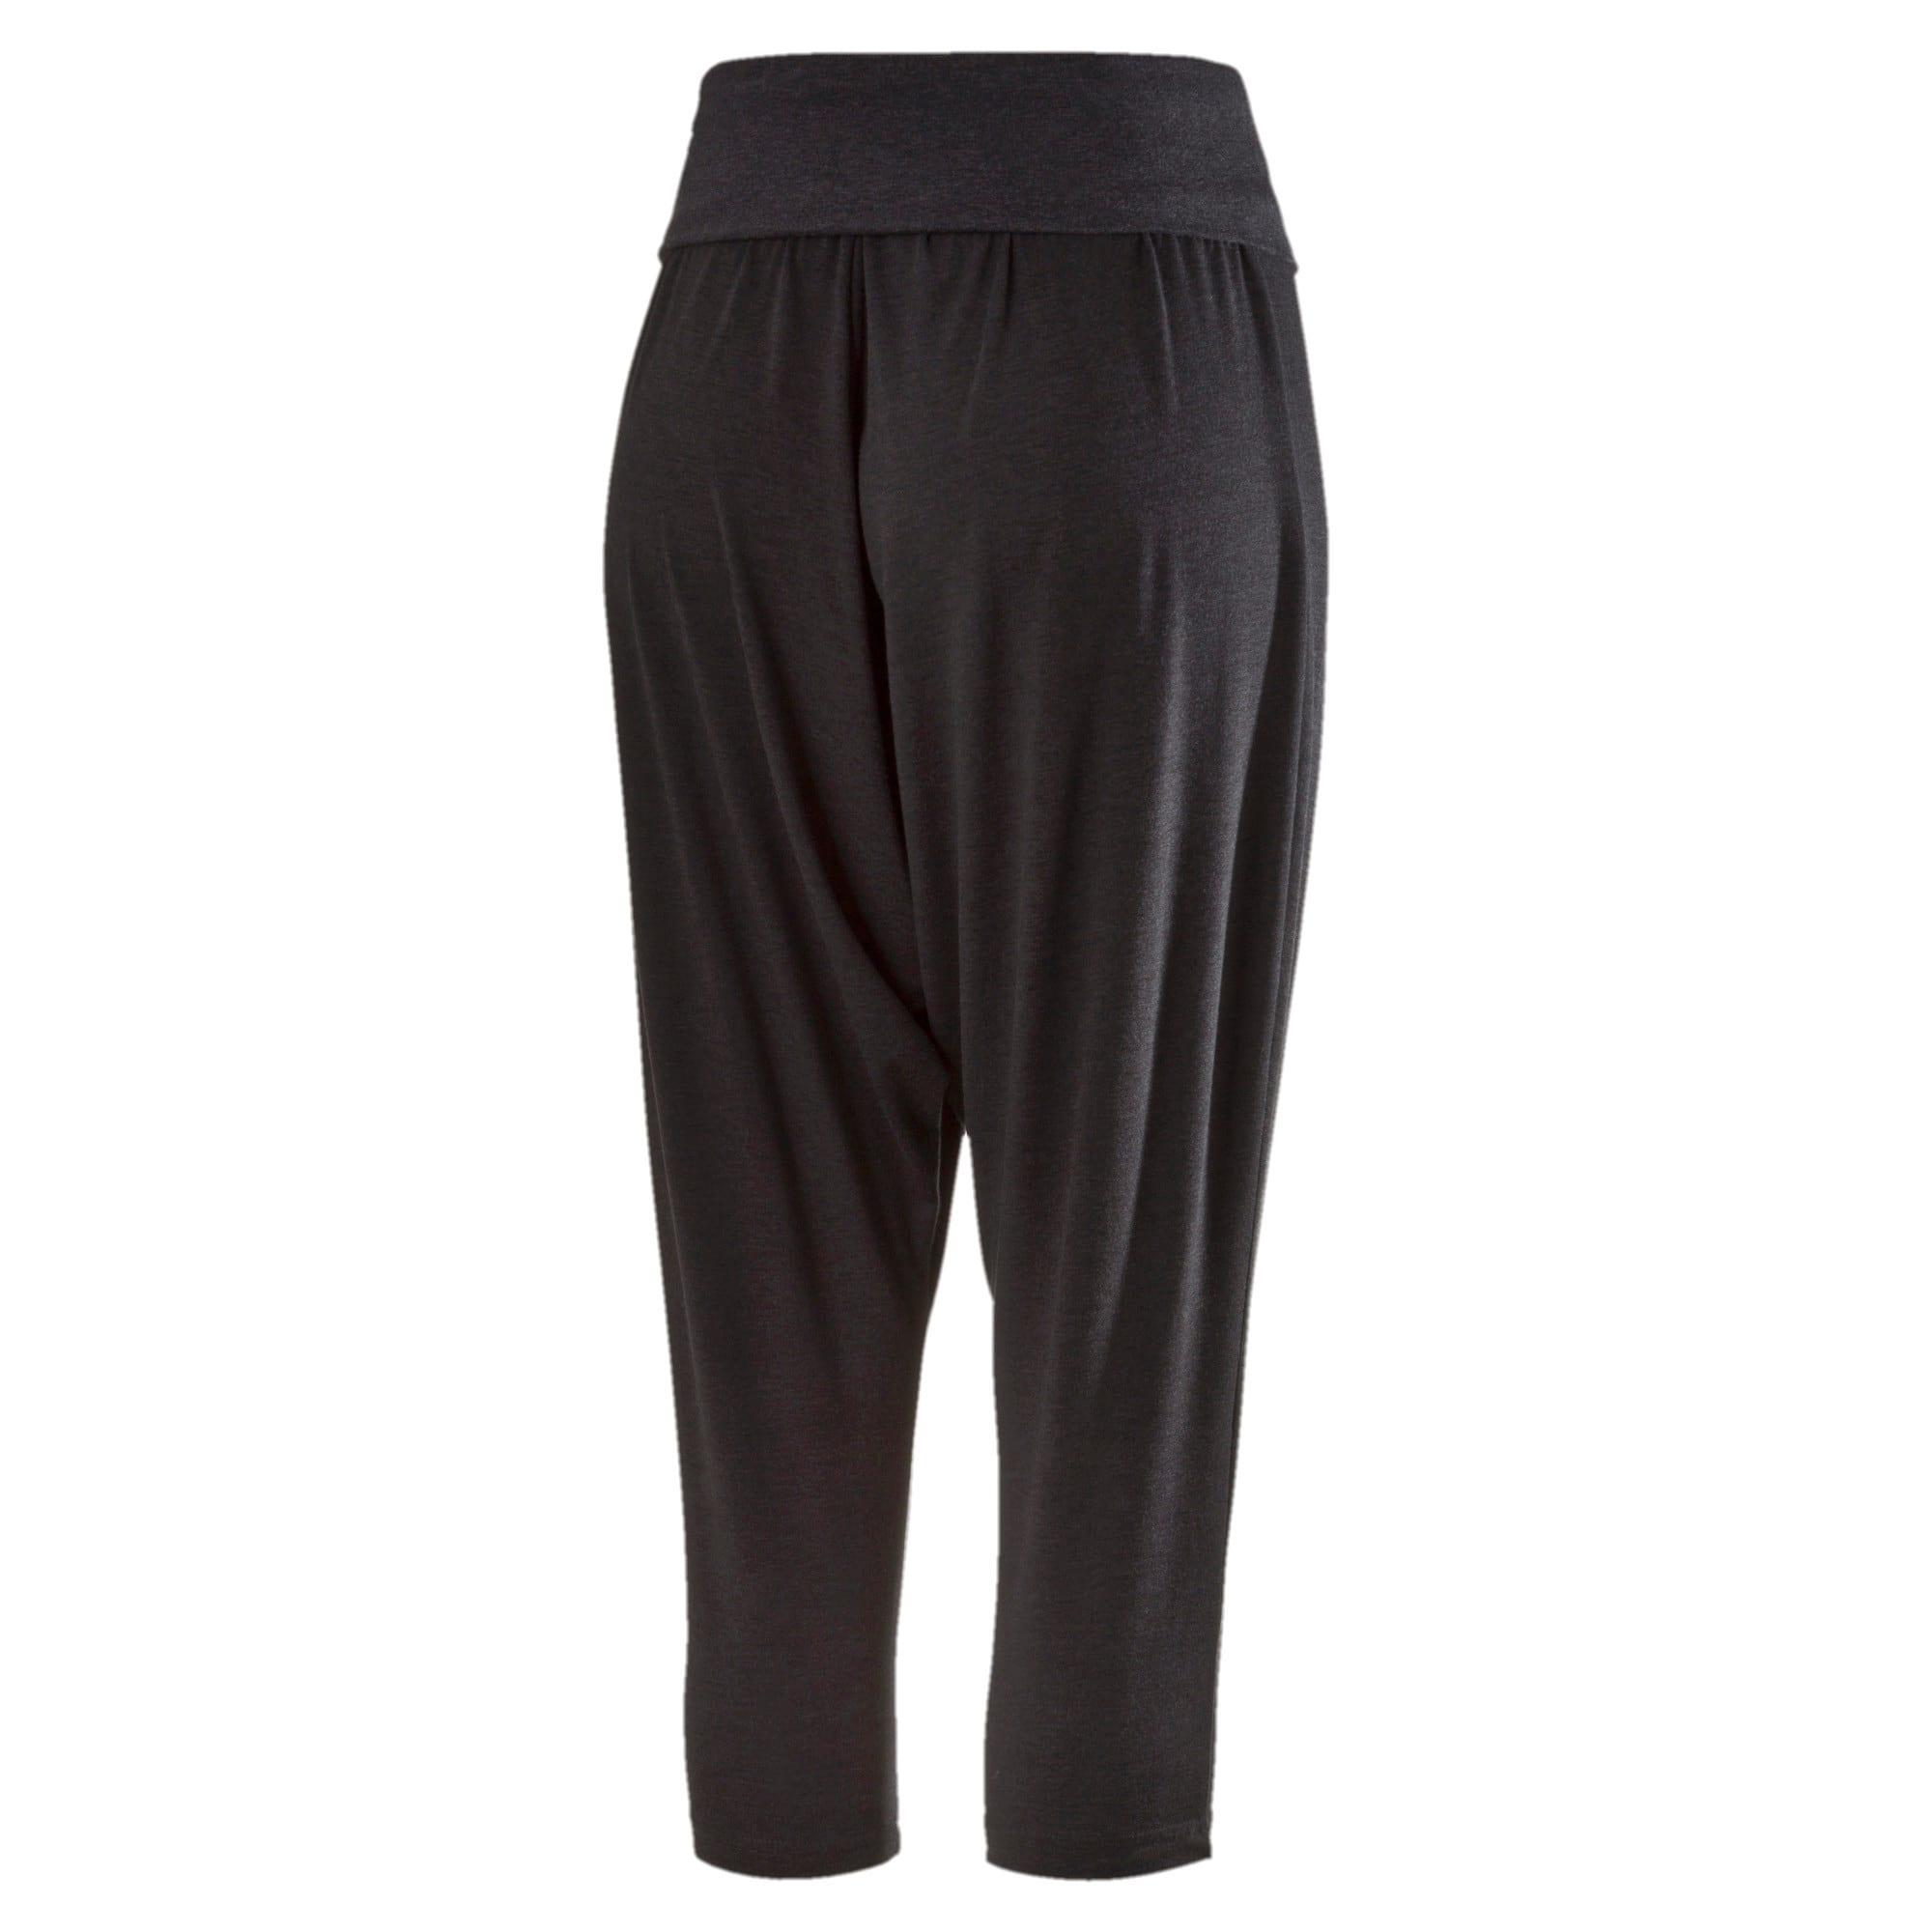 Thumbnail 2 of Active Training Women's Dancer Draped 3/4 Pants, dark gray heather, medium-IND